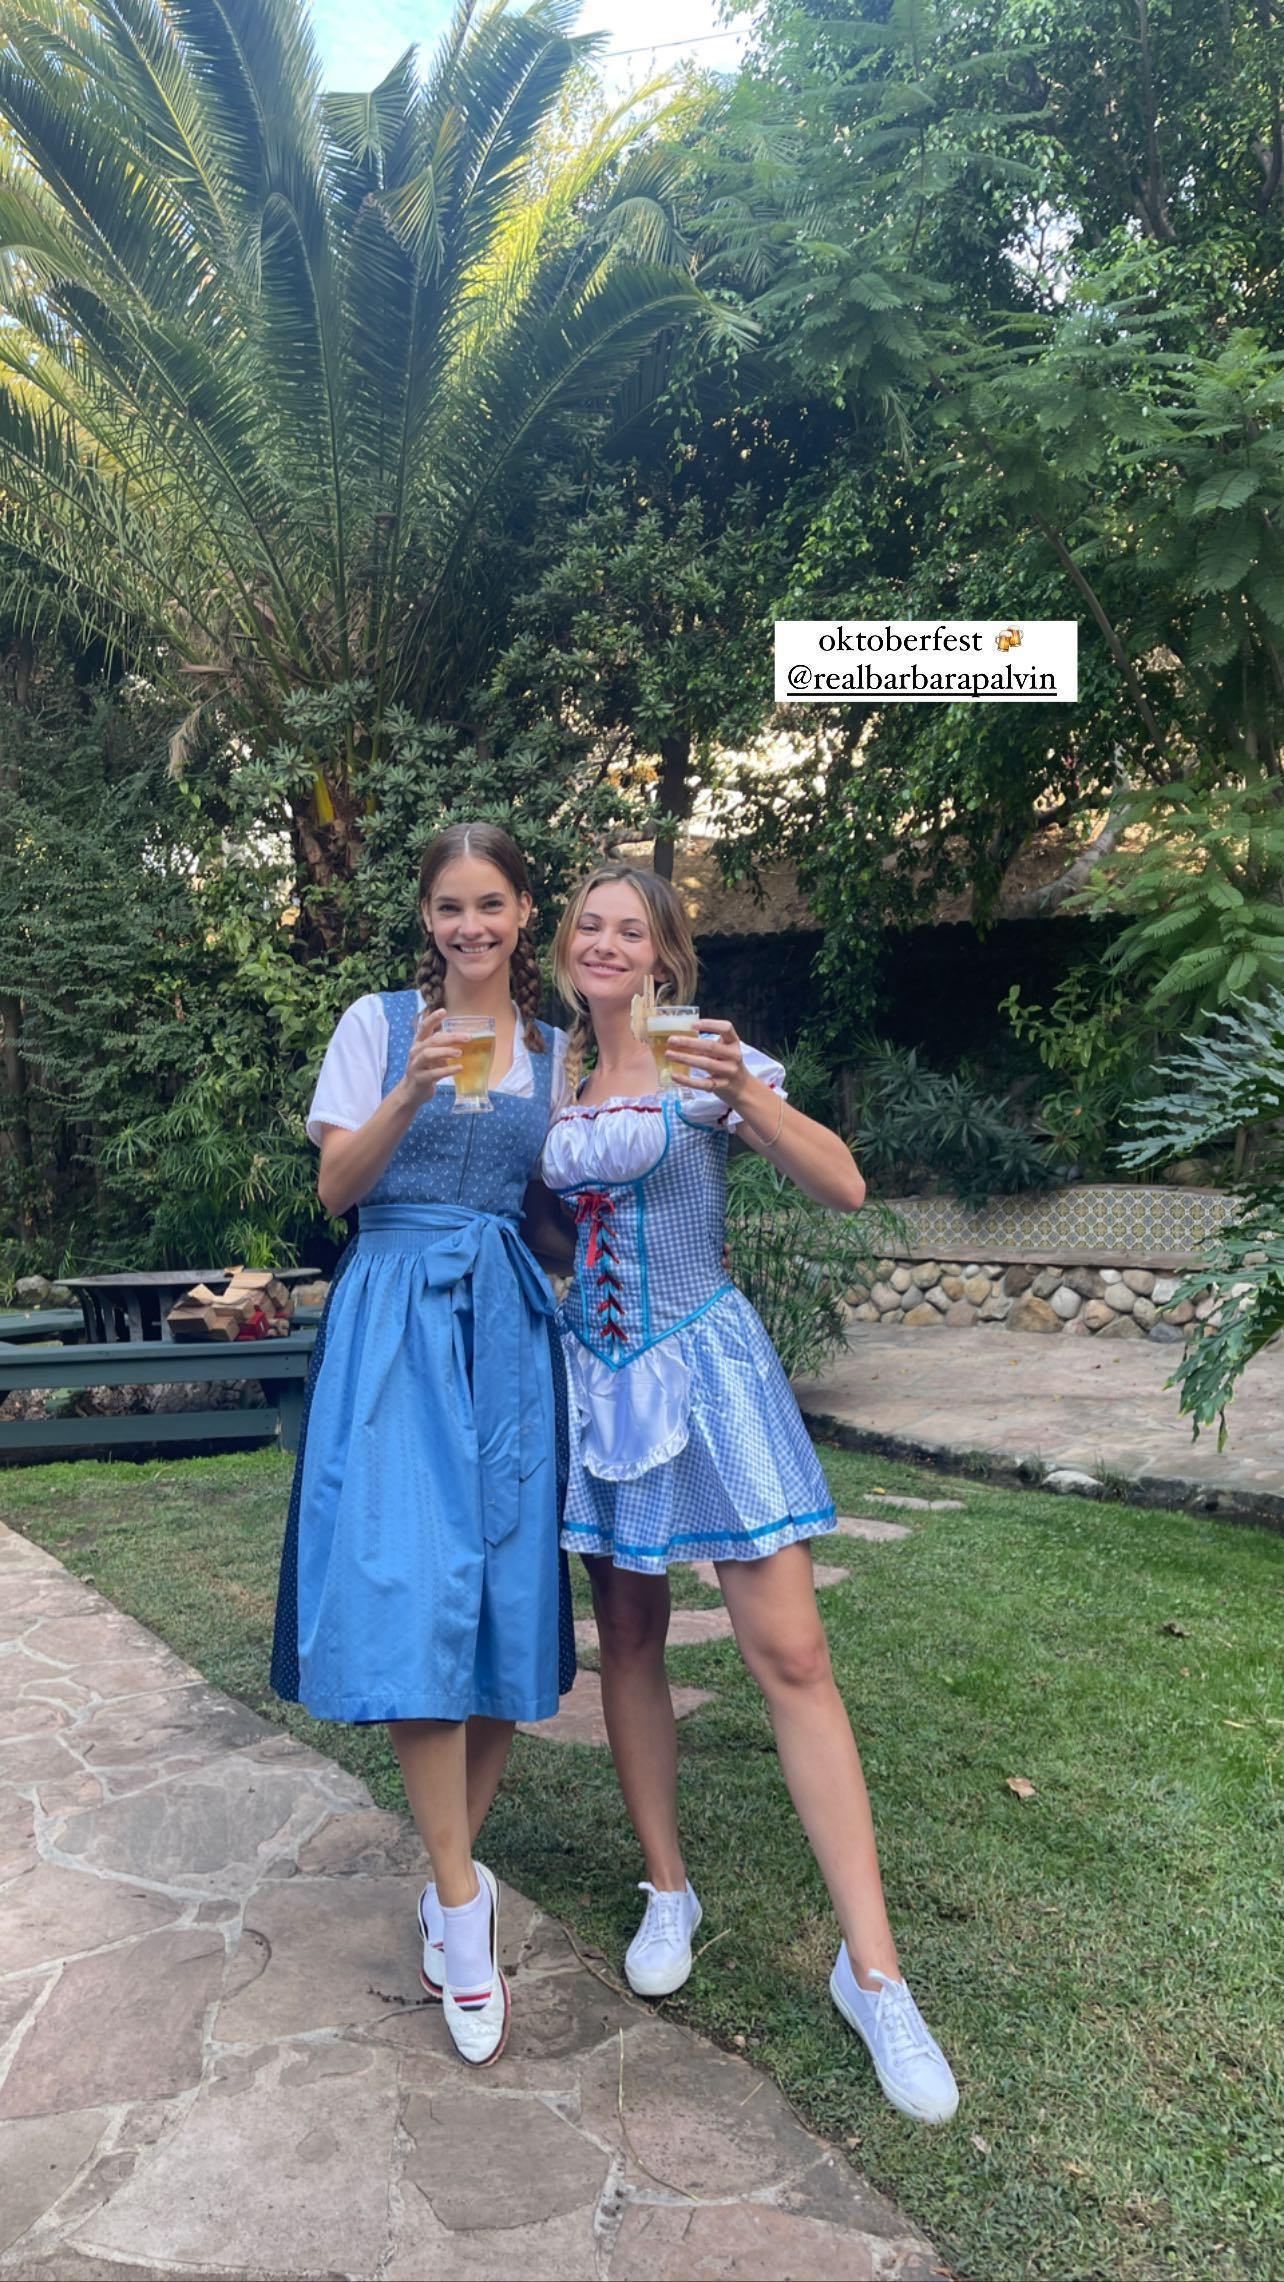 L?anniversaire de Barbara Palvin à l?Oktoberfest! - Photo 4